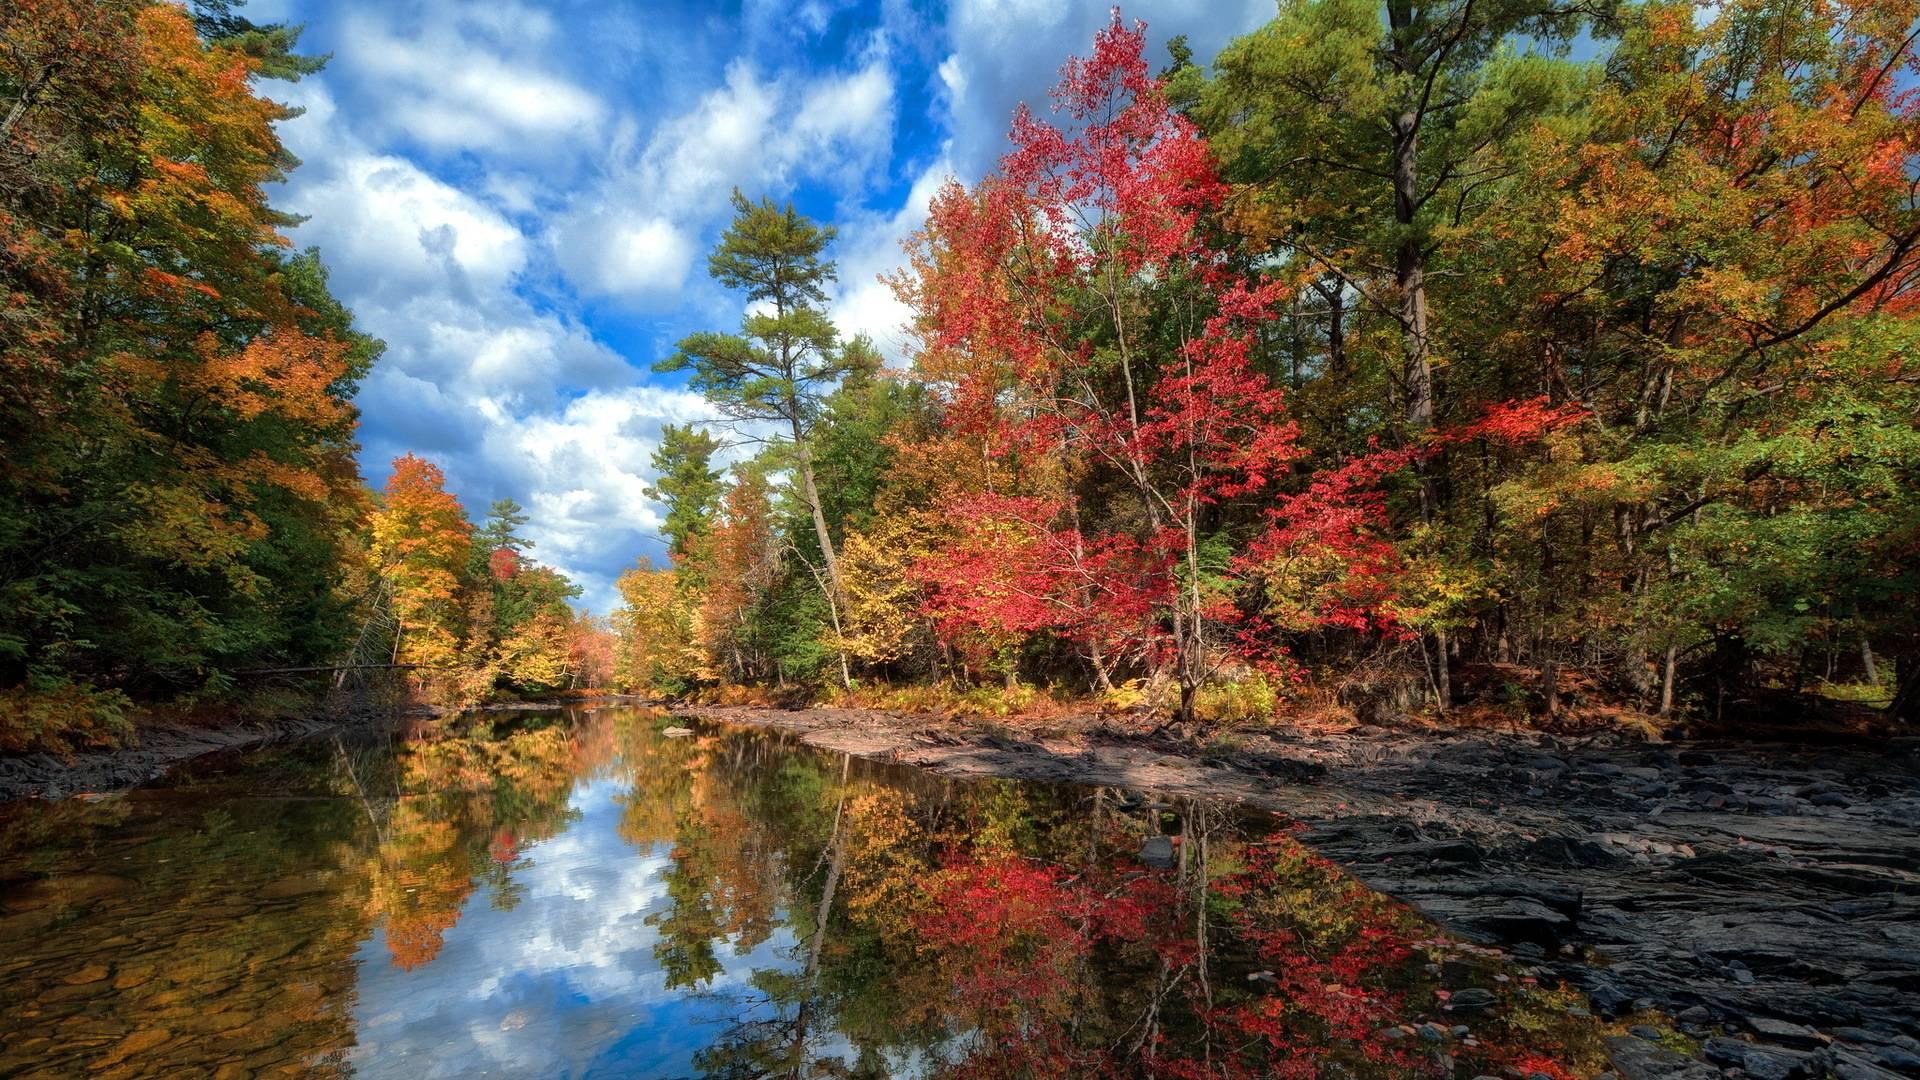 Autumn HD Wallpapers - Wallpaper Cave